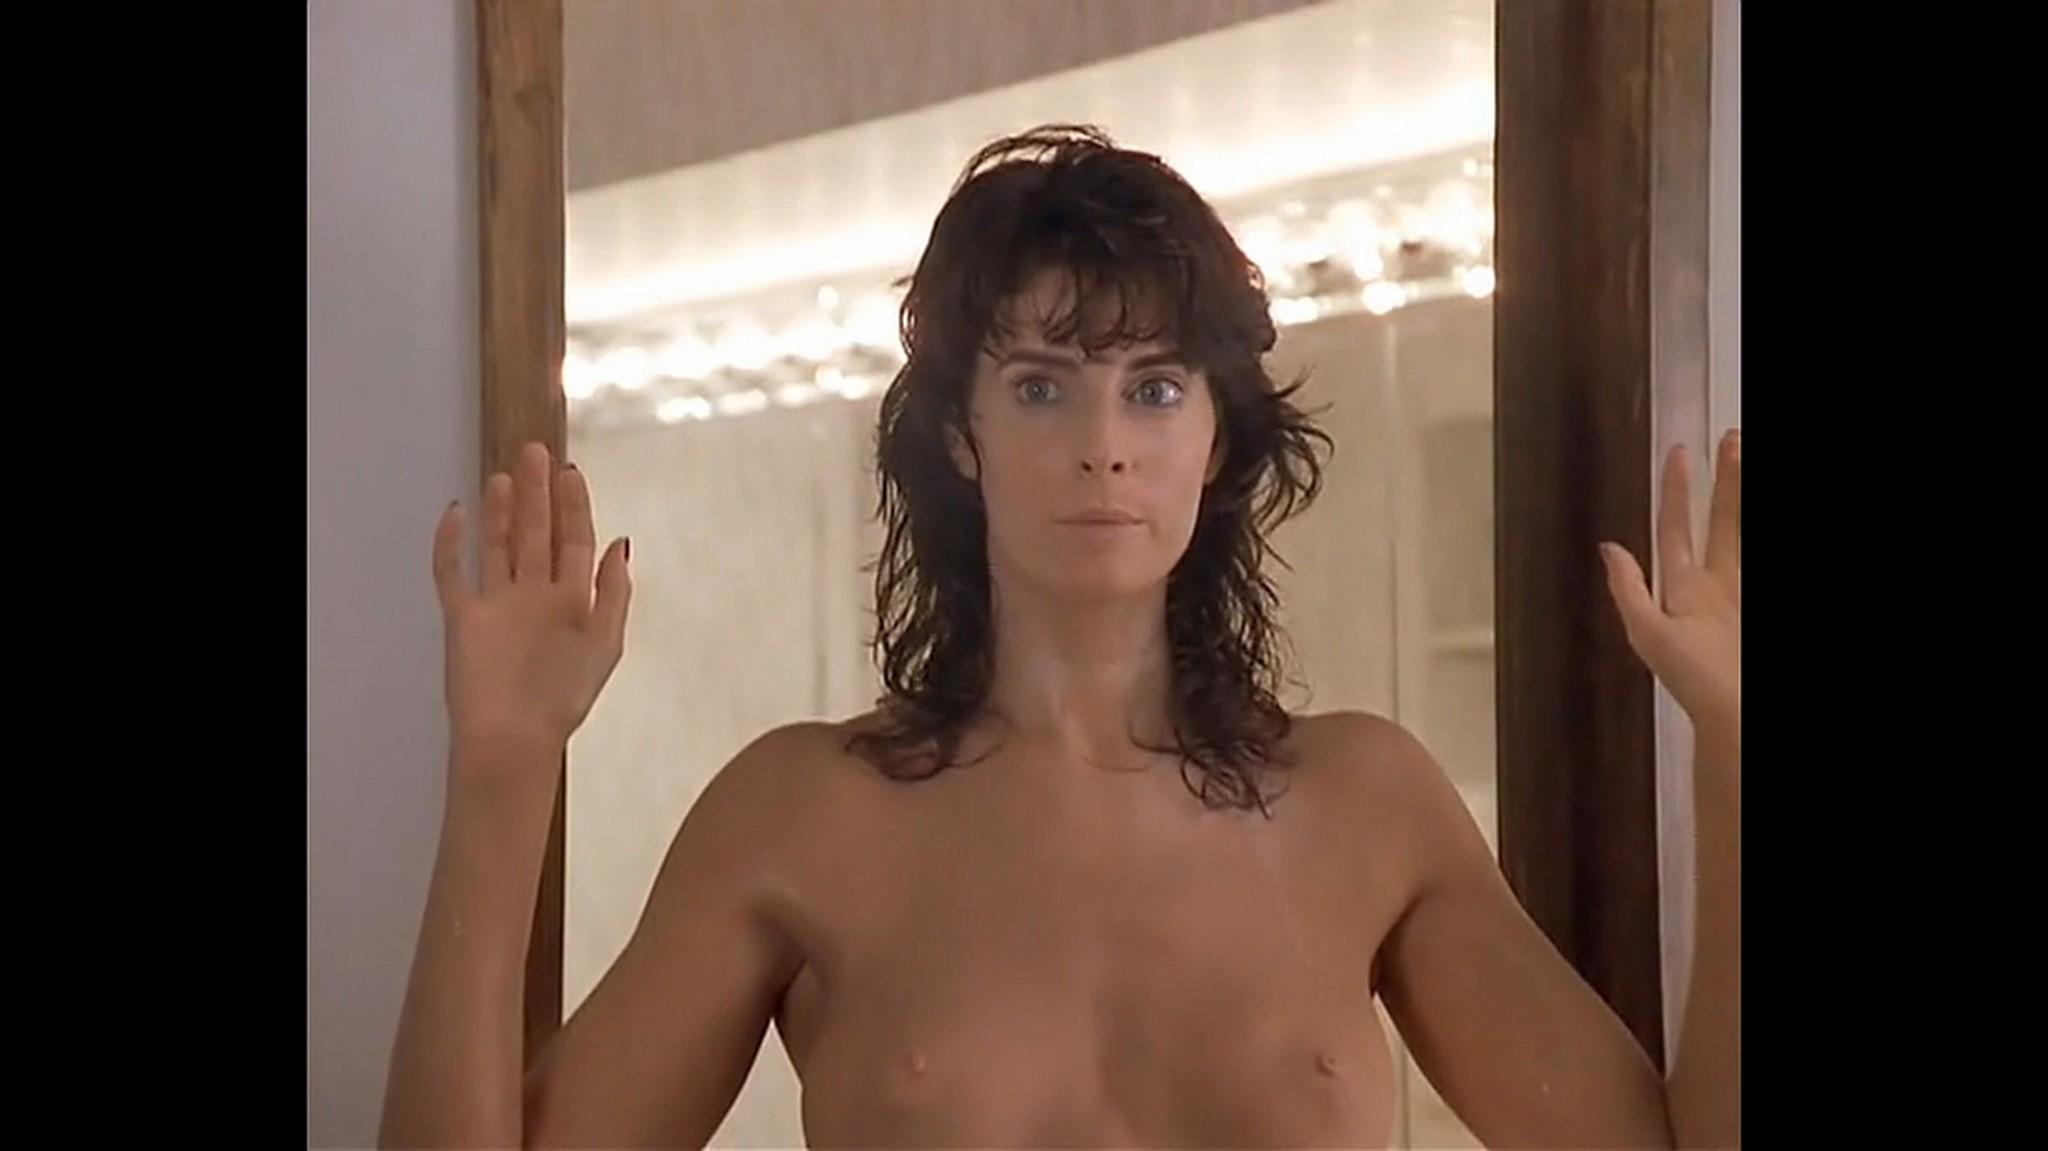 Joan Severance nude topless - See No Evil Hear No Evil (1989) HD 720/1080p (12)